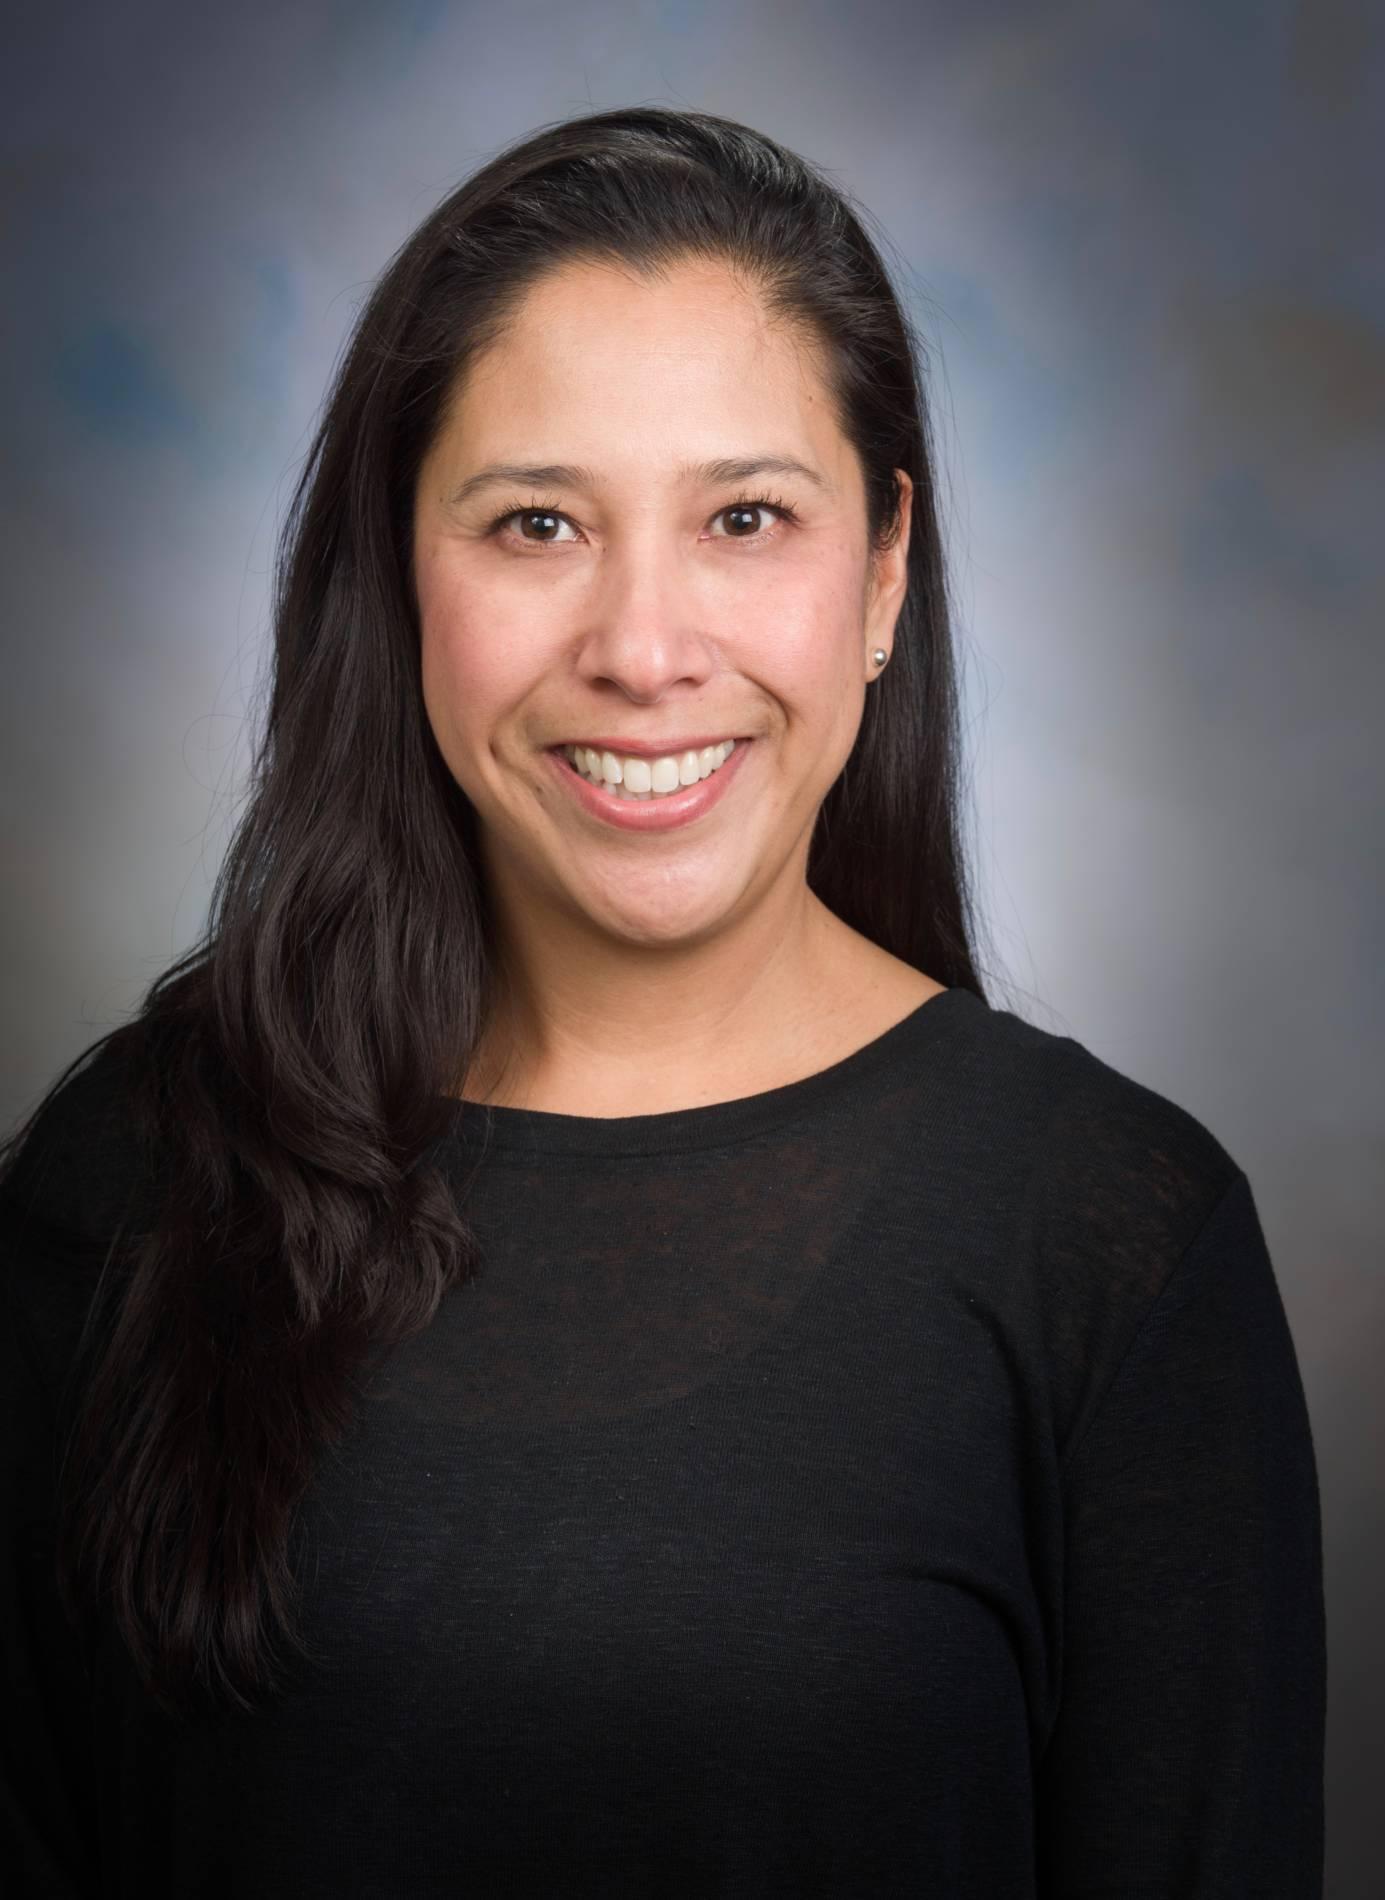 Christina Pasana, ColoradoSPH at CSU